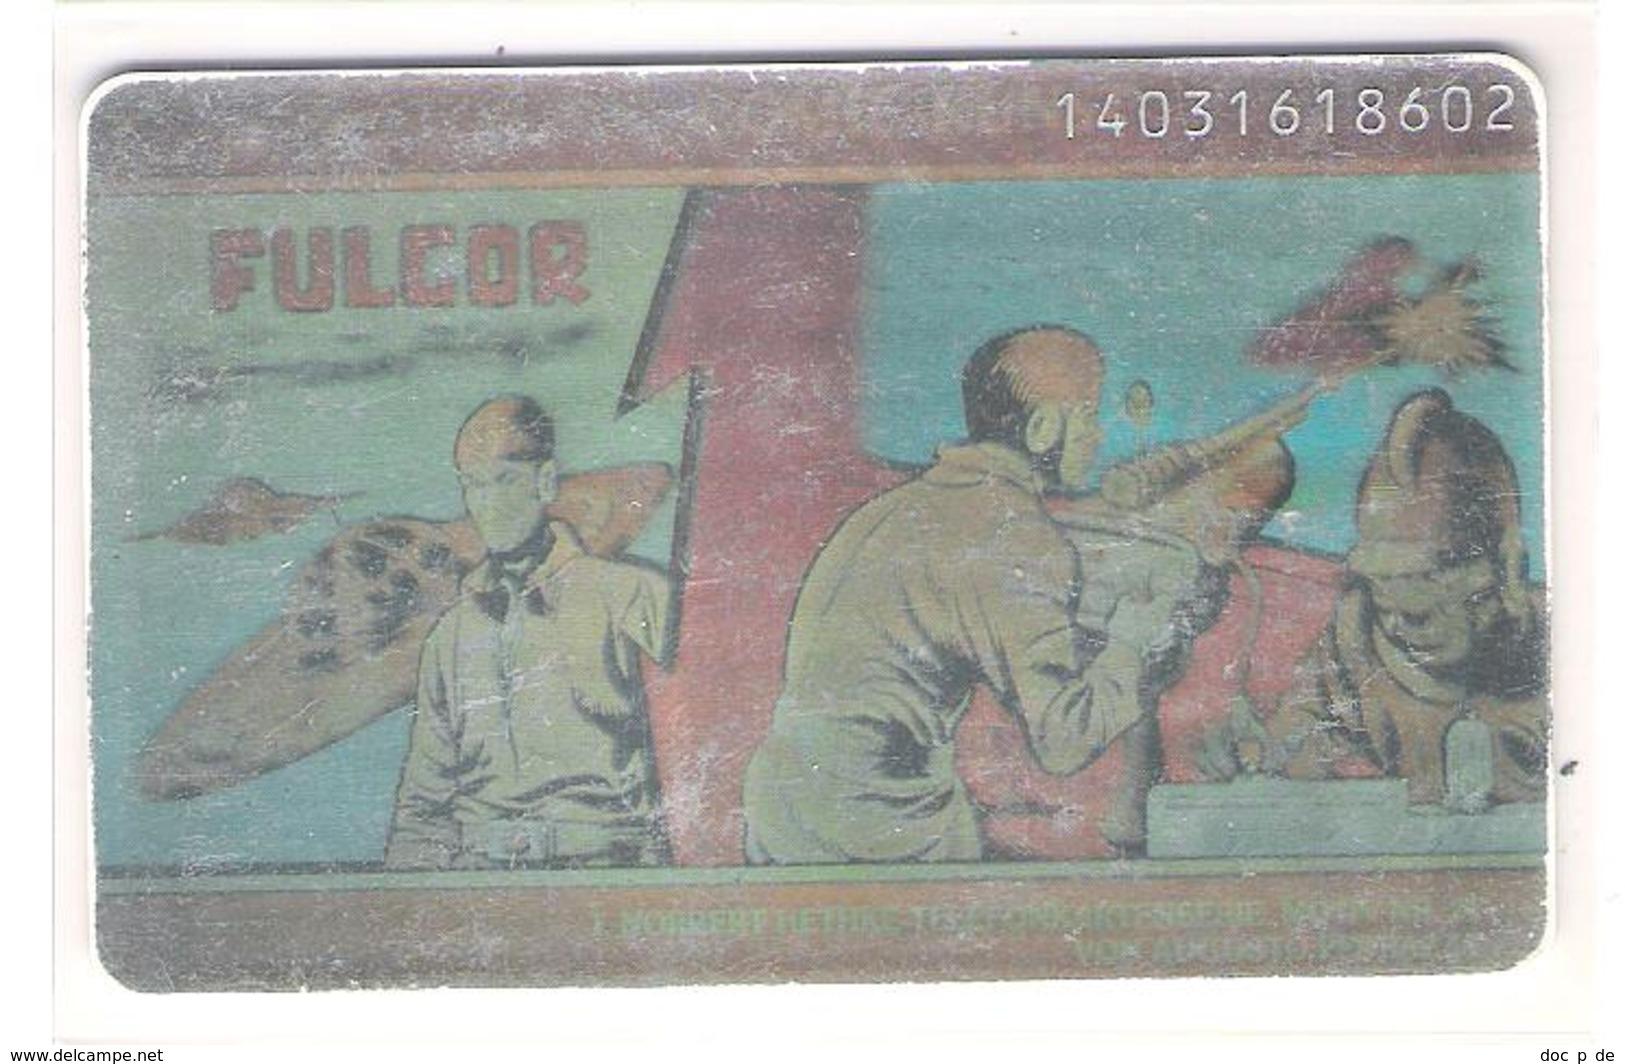 Germany - S 11/94 - Fulgor Hethke Comic Card - Hologram - Hologramm - Weltraumflieger - Germany